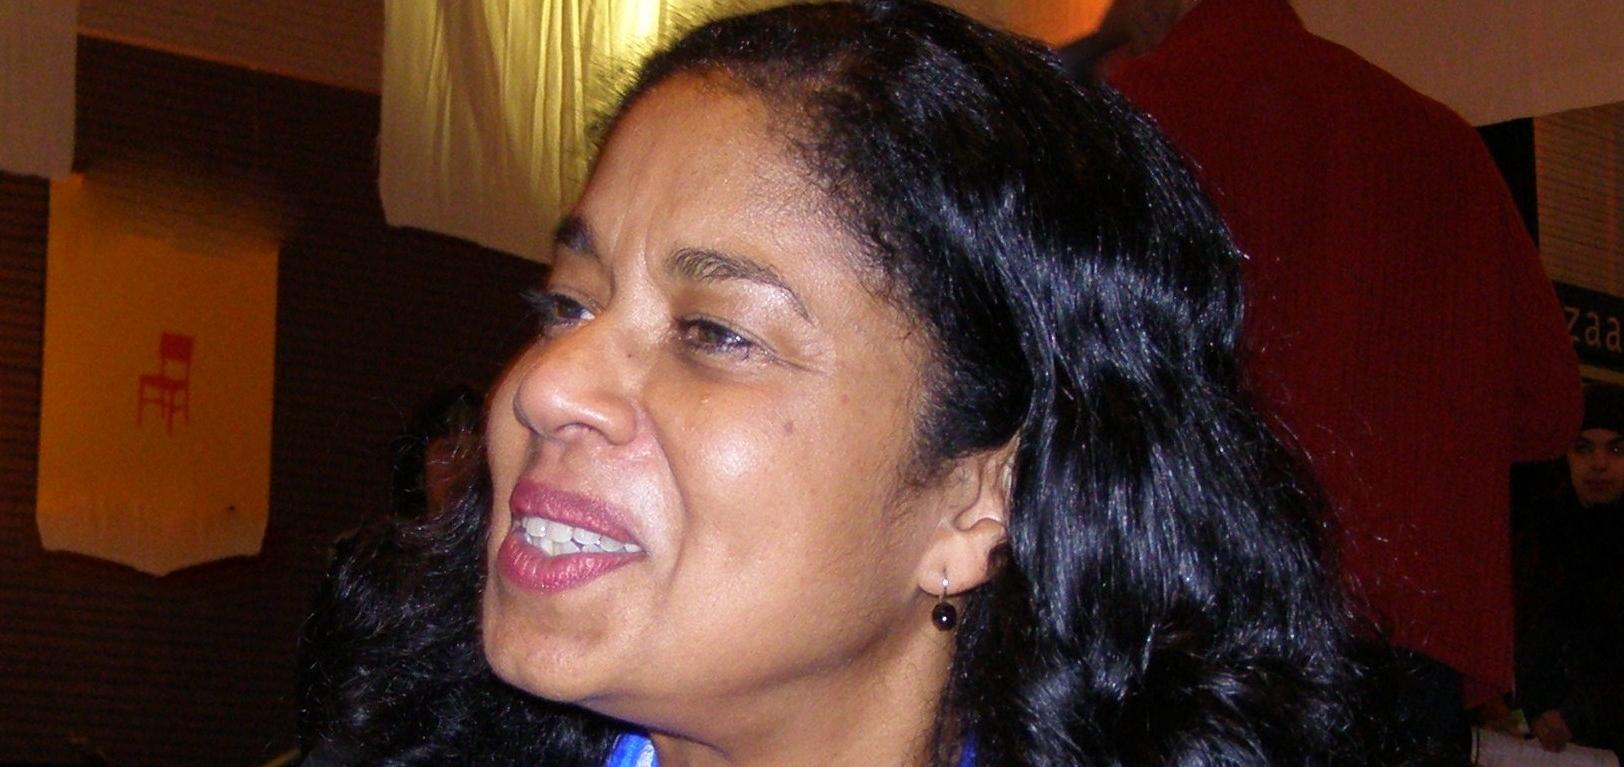 Nankoe, Lucia S